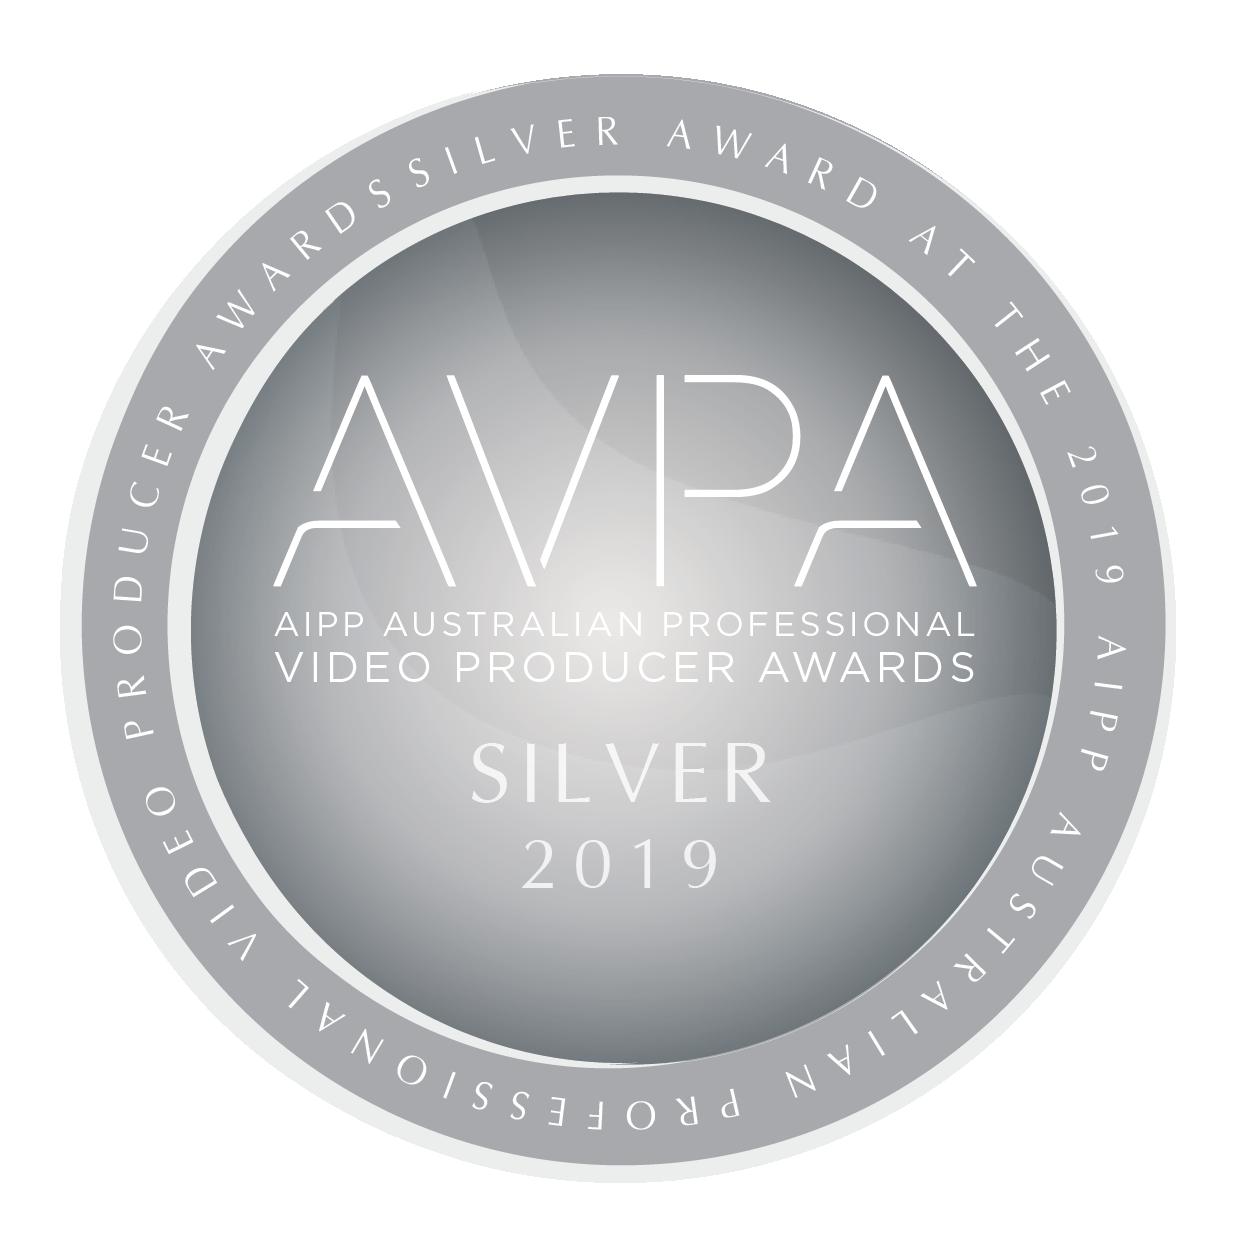 APPA Silver Award 2019